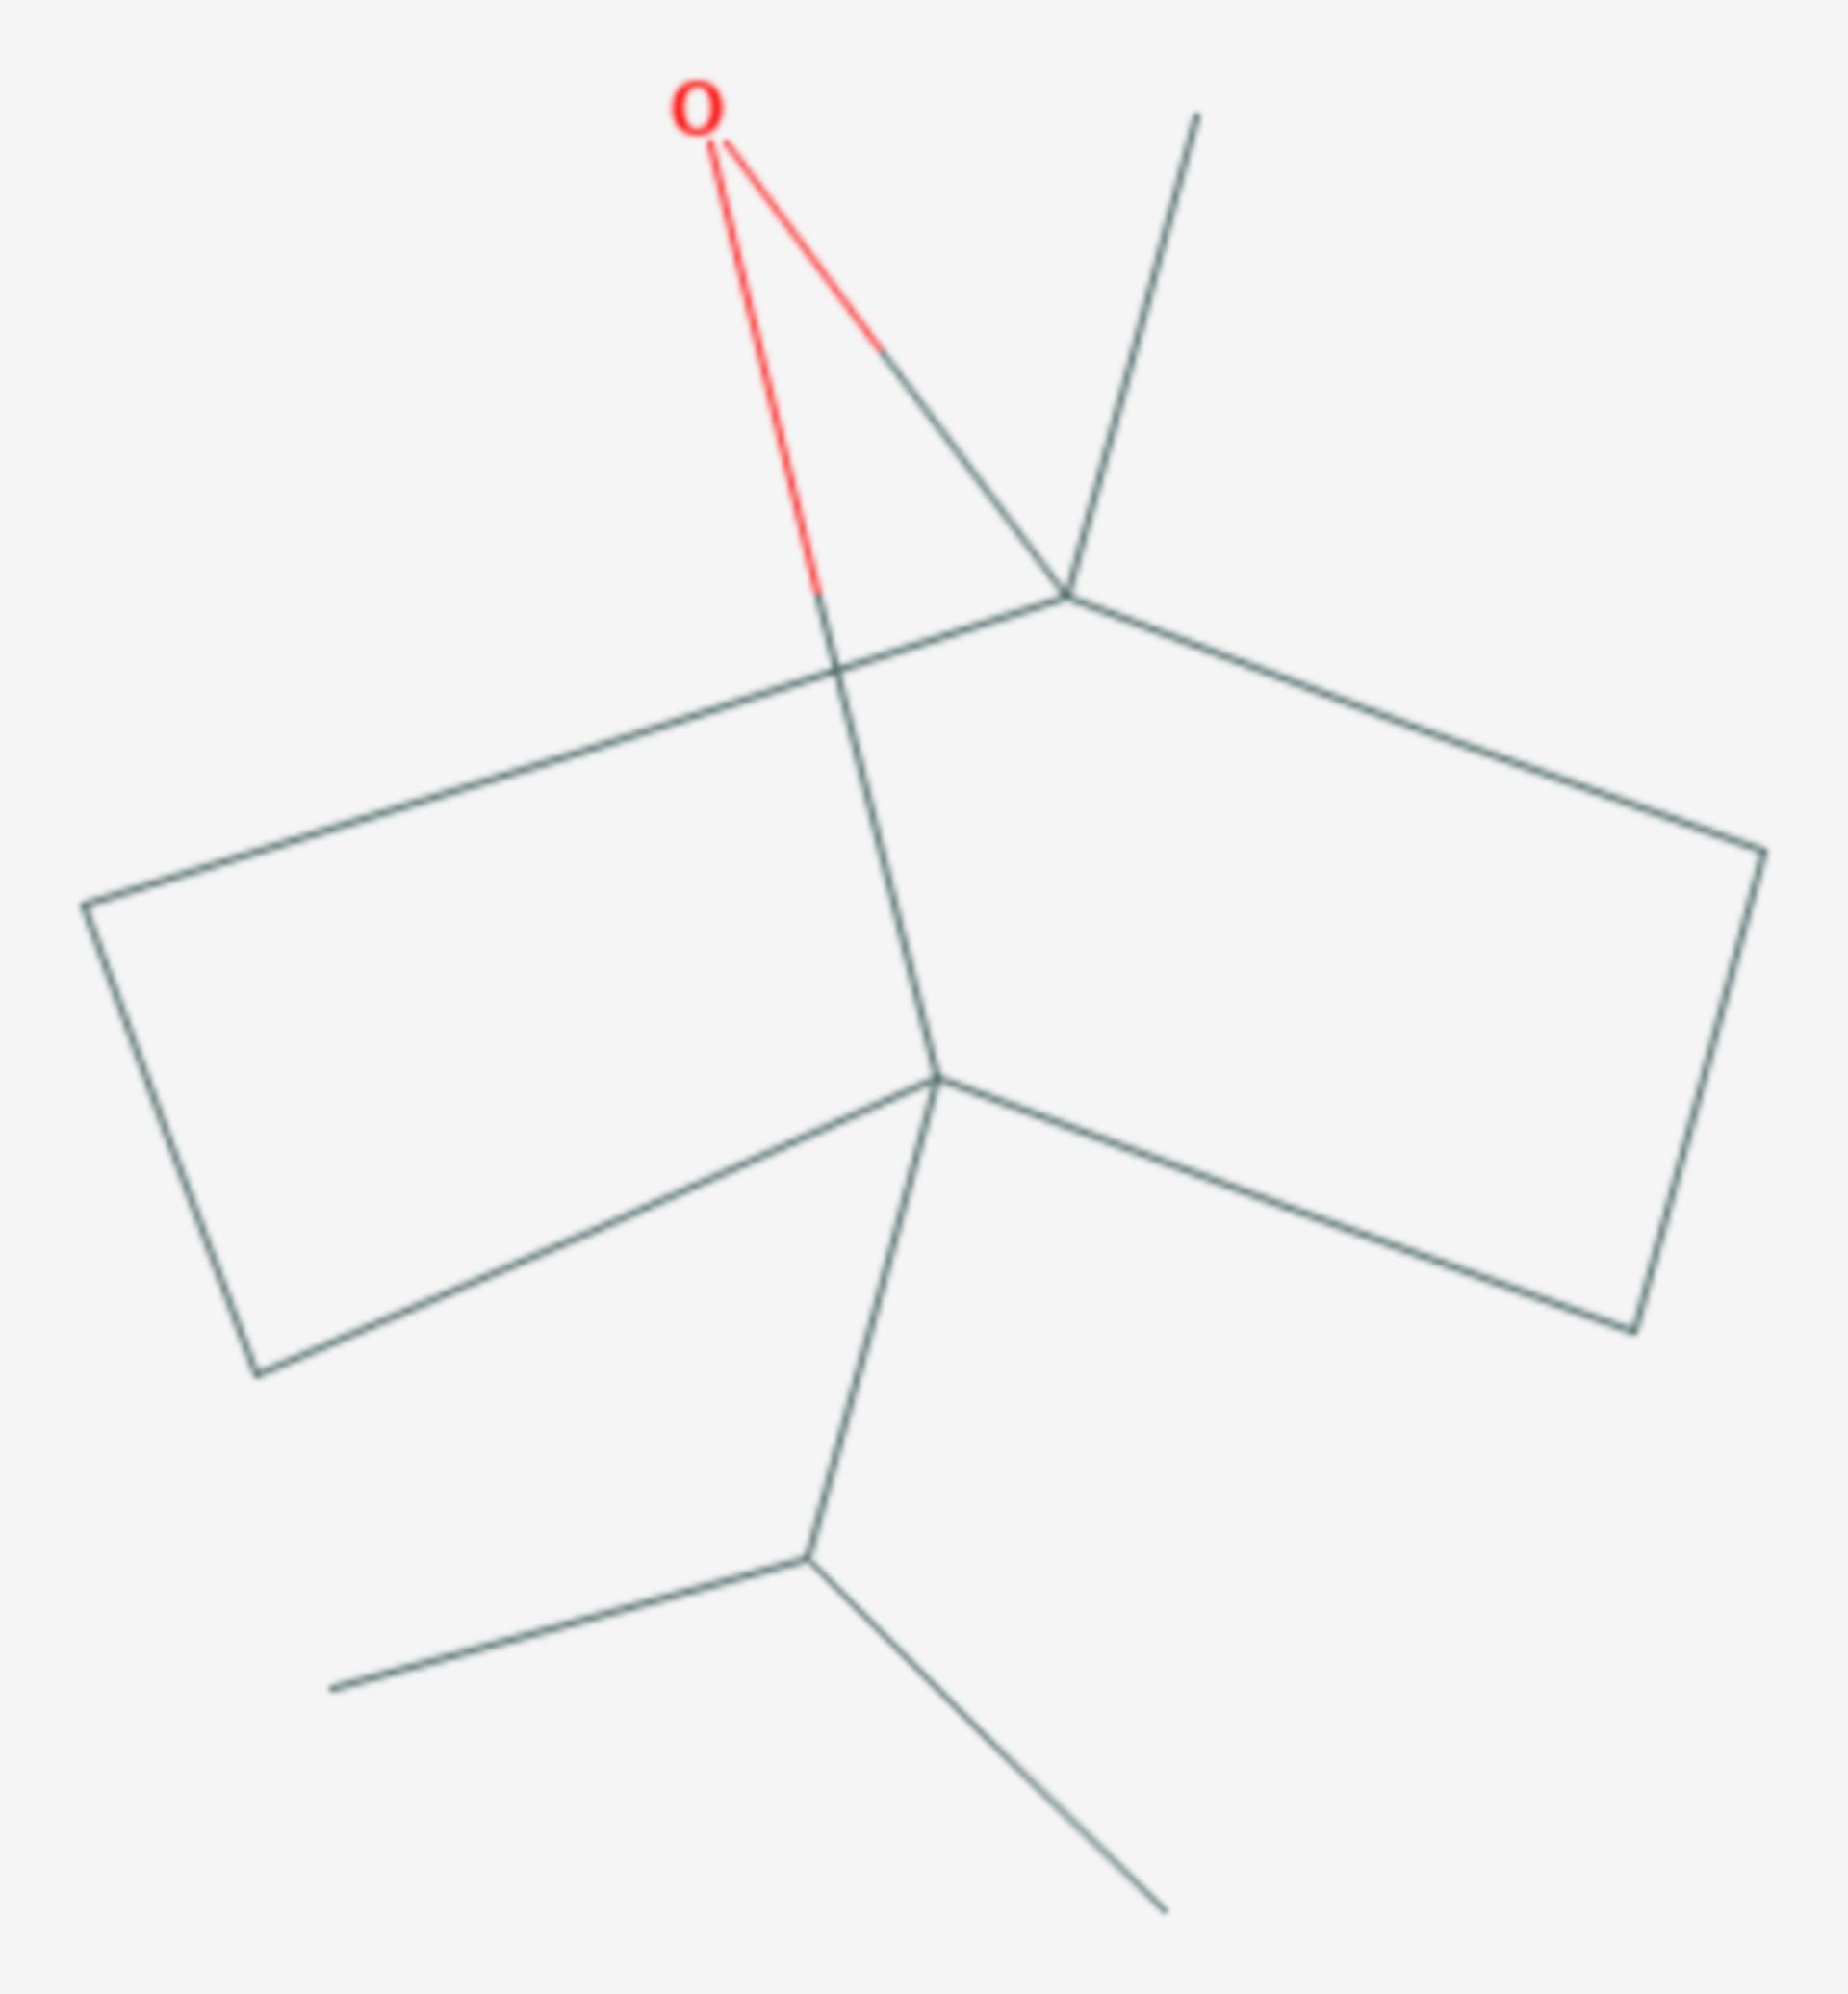 1,4-Cineol (Strukturformel)